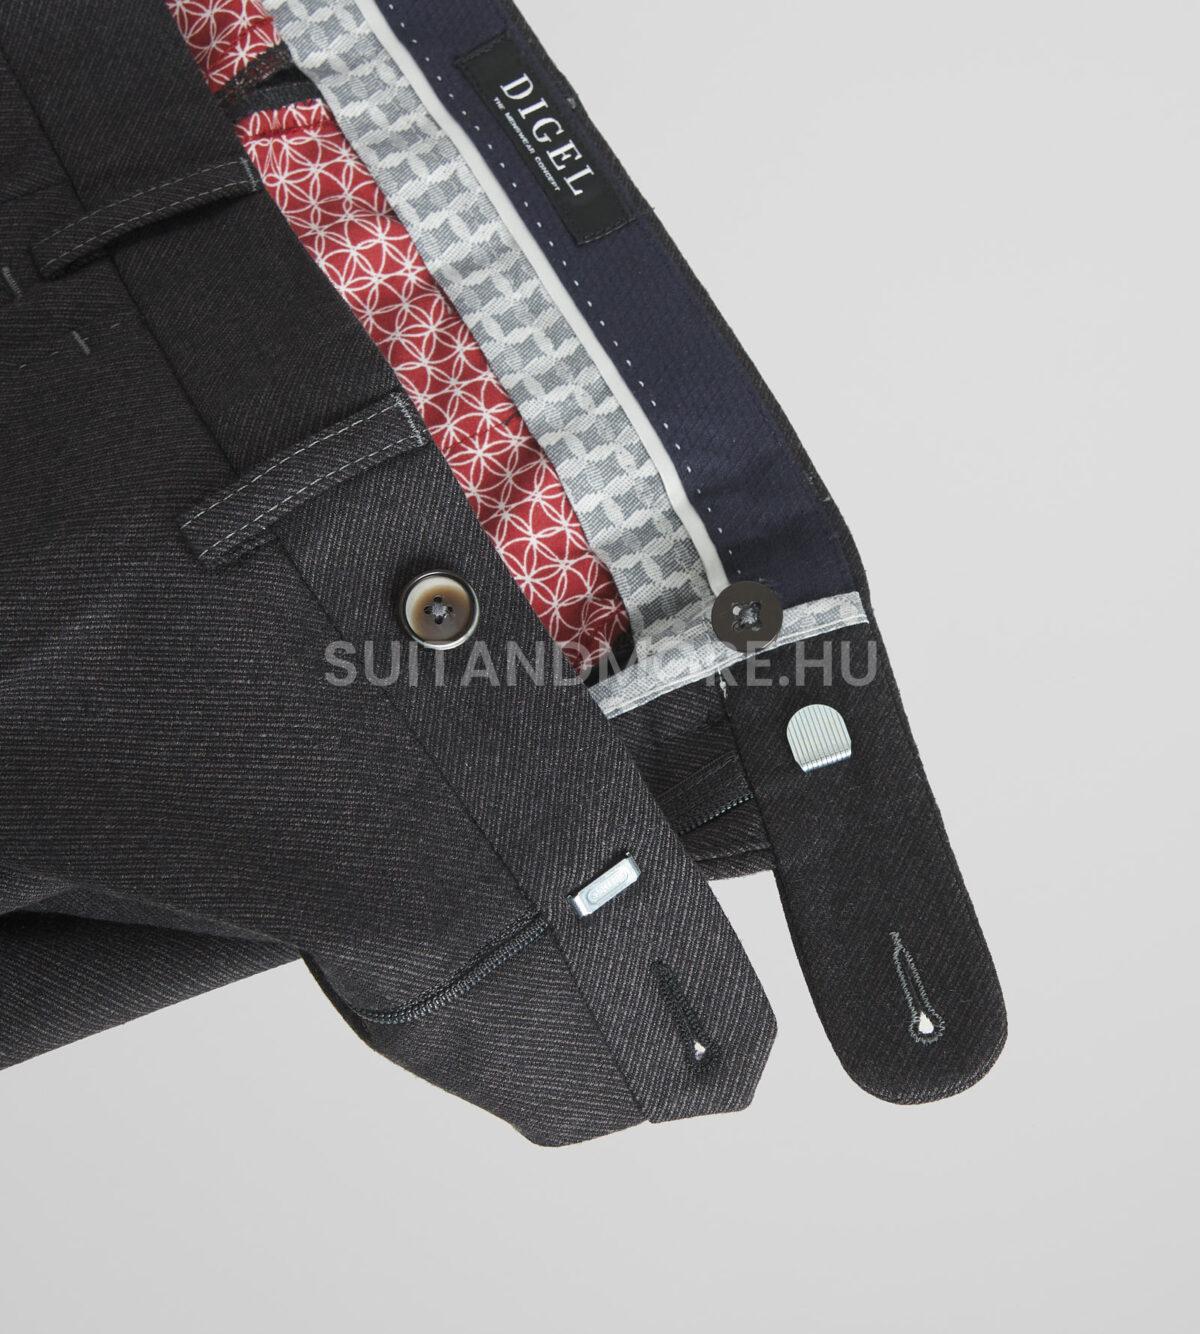 sötétszürke-modern-fit-gyapjú-kevert-szövetnadrág-SERGIO-1281243-40-04